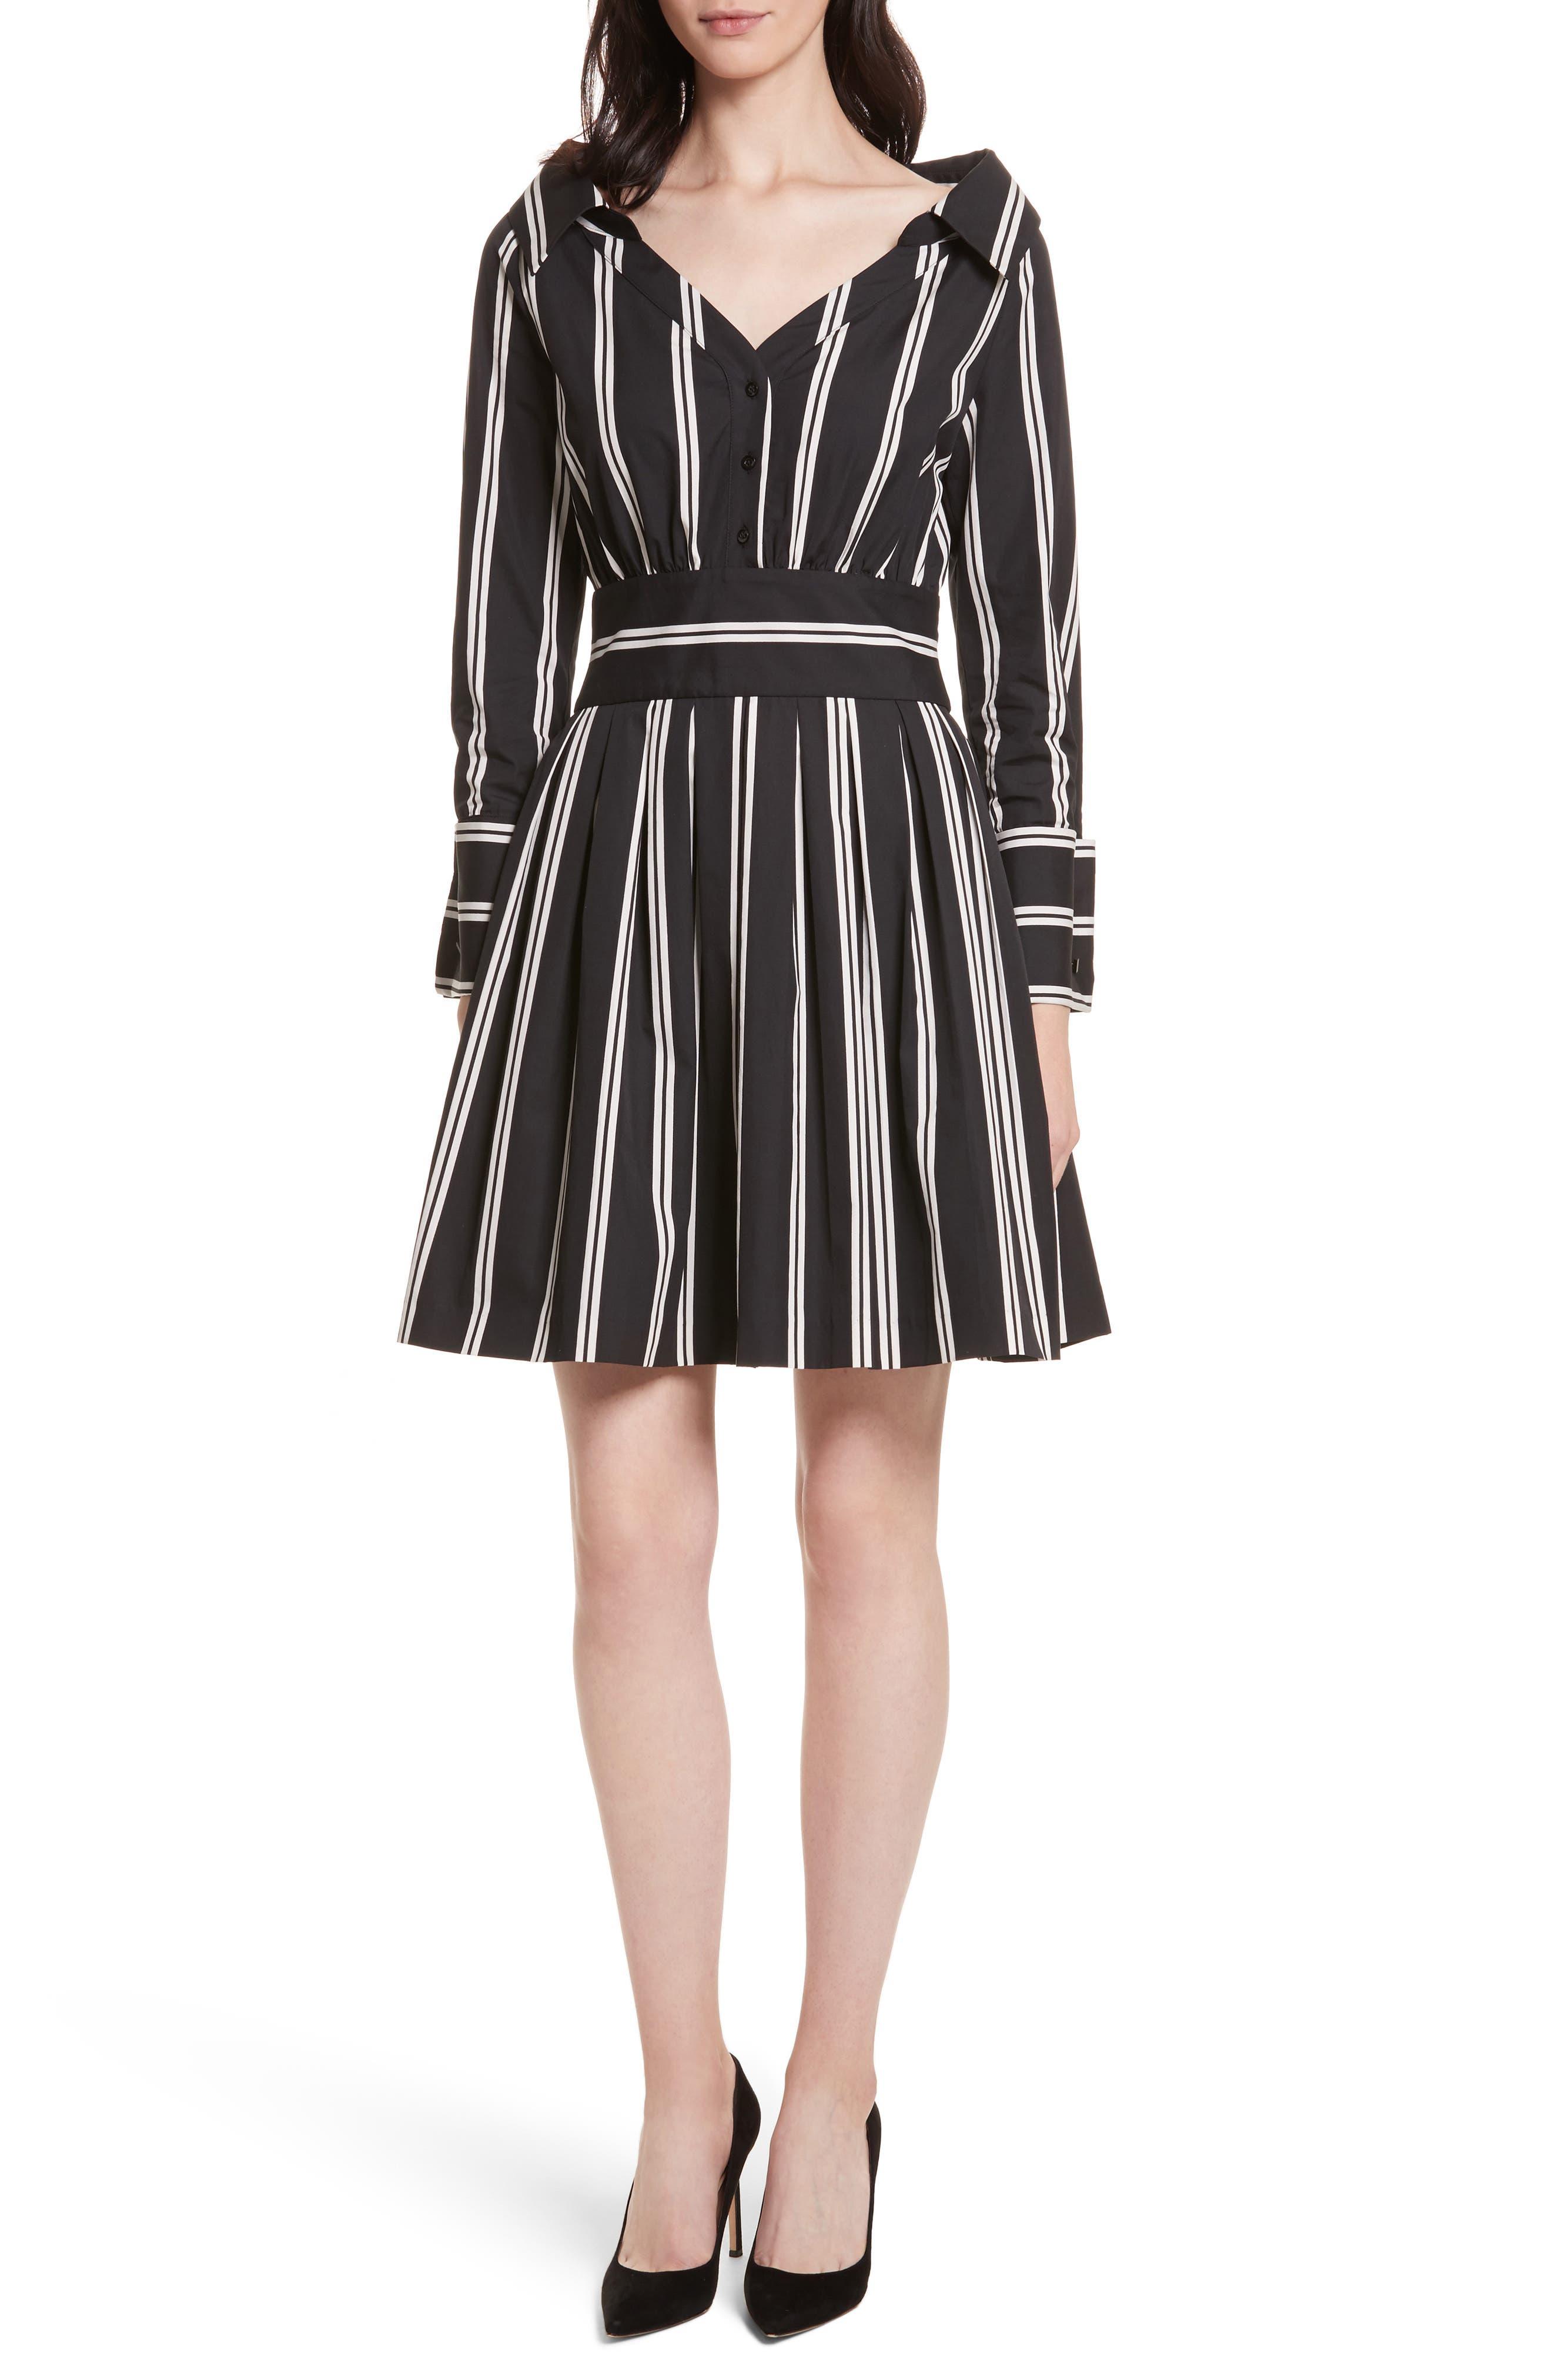 Alternate Image 1 Selected - Alice + Olivia Iliana Stripe Fit & Flare Dress